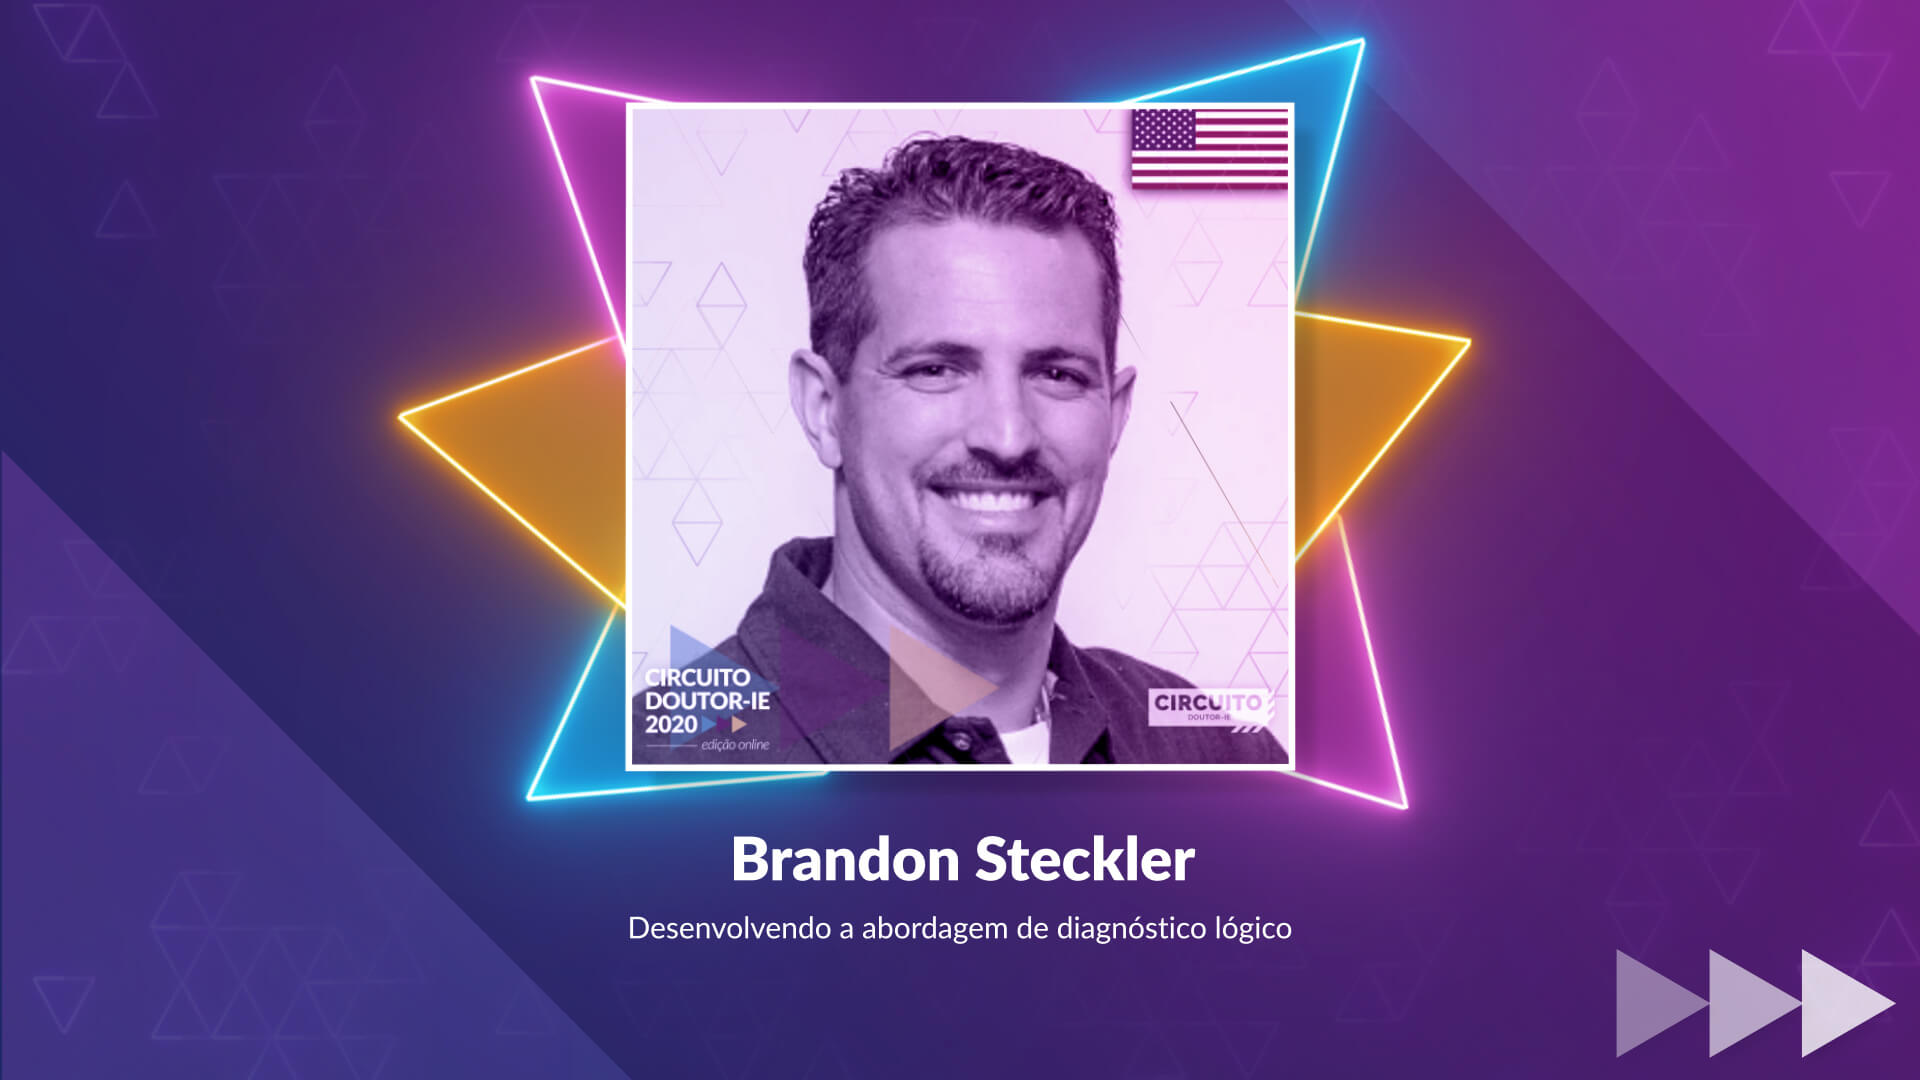 Circuito Doutor-IE 2020 edição online - palestrante Brandon Steckler